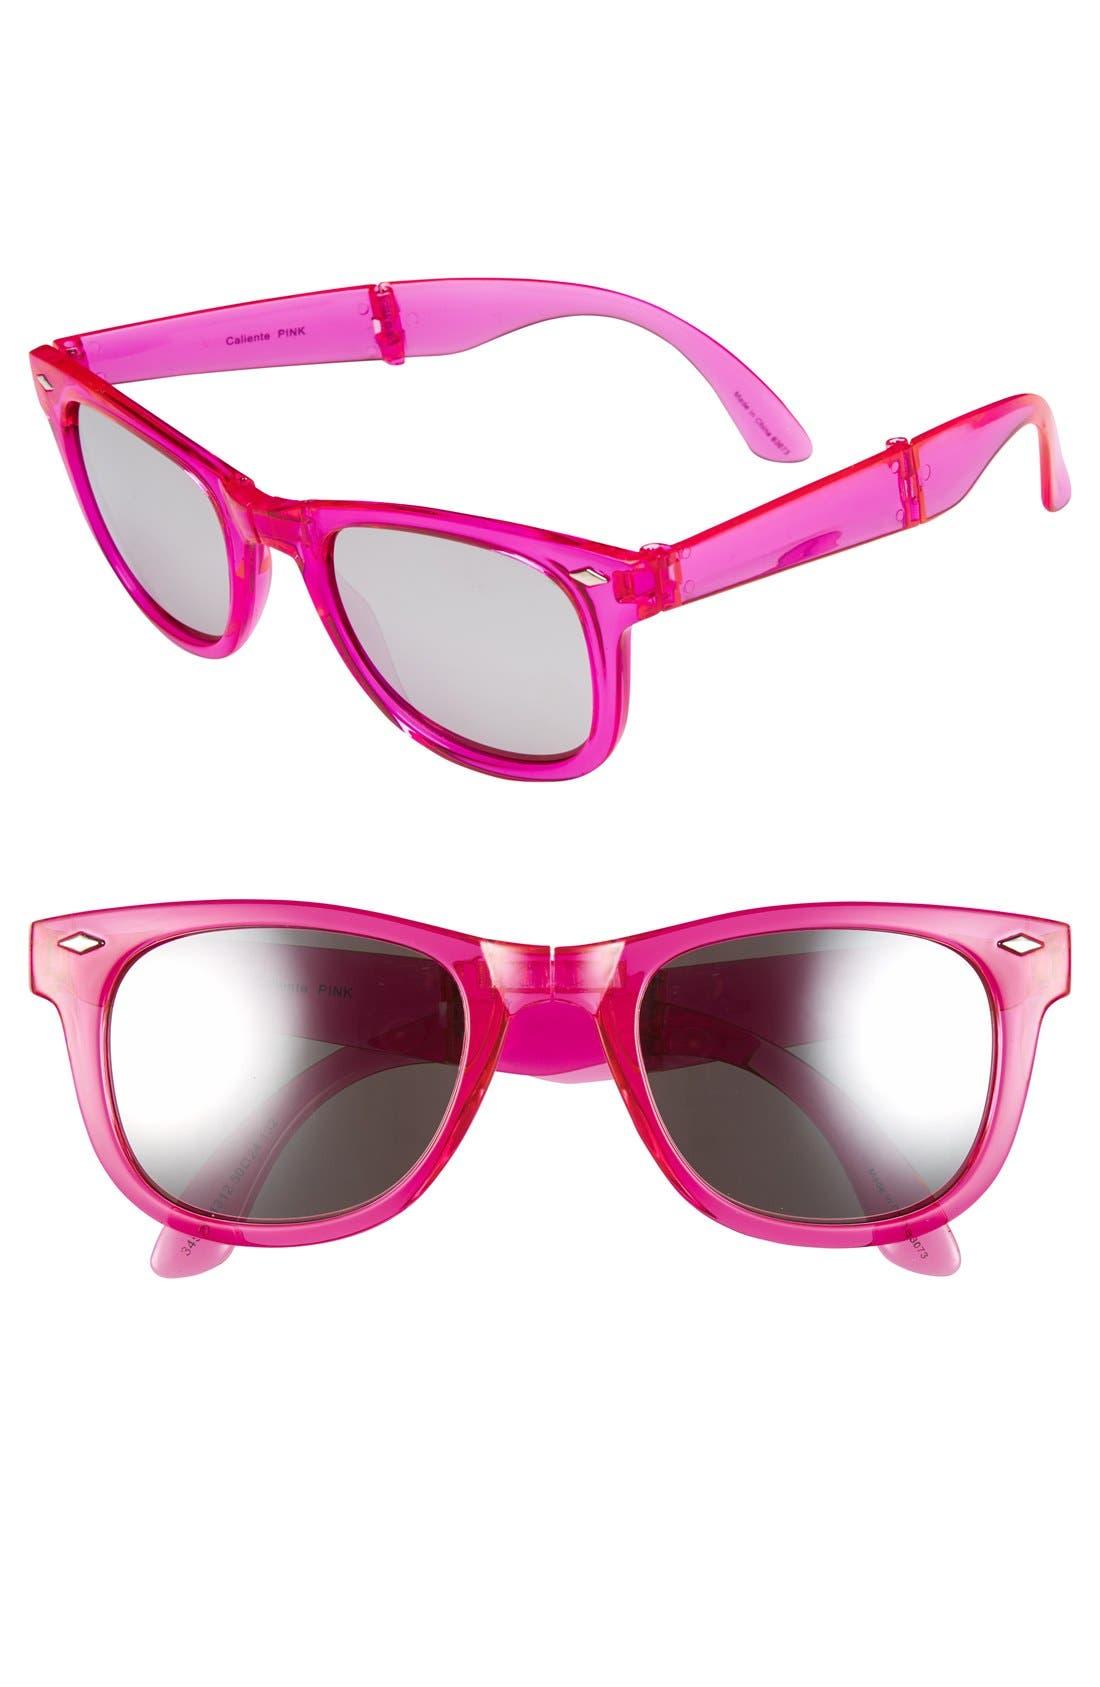 Main Image - Outlook Eyewear 'Caliente' 50mm Foldable Sunglasses